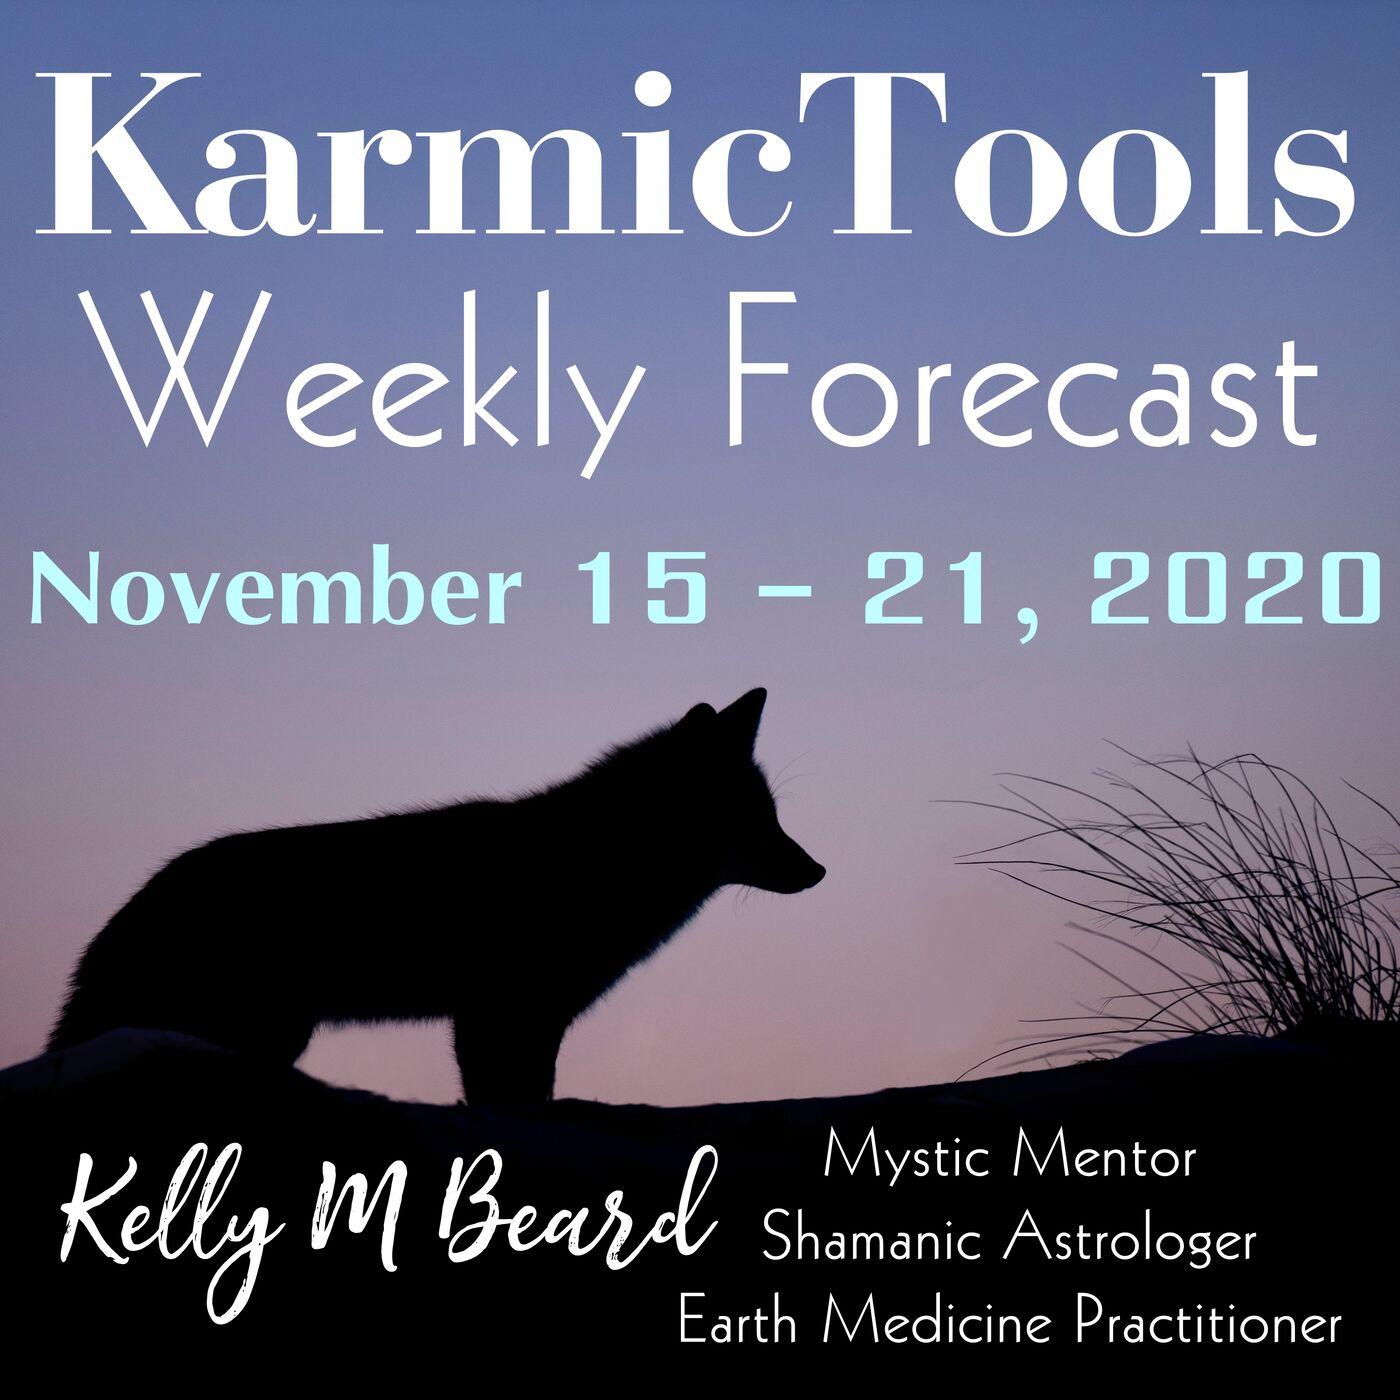 Nov 15 - 21, 2020 KarmicTools Weekly Forecast